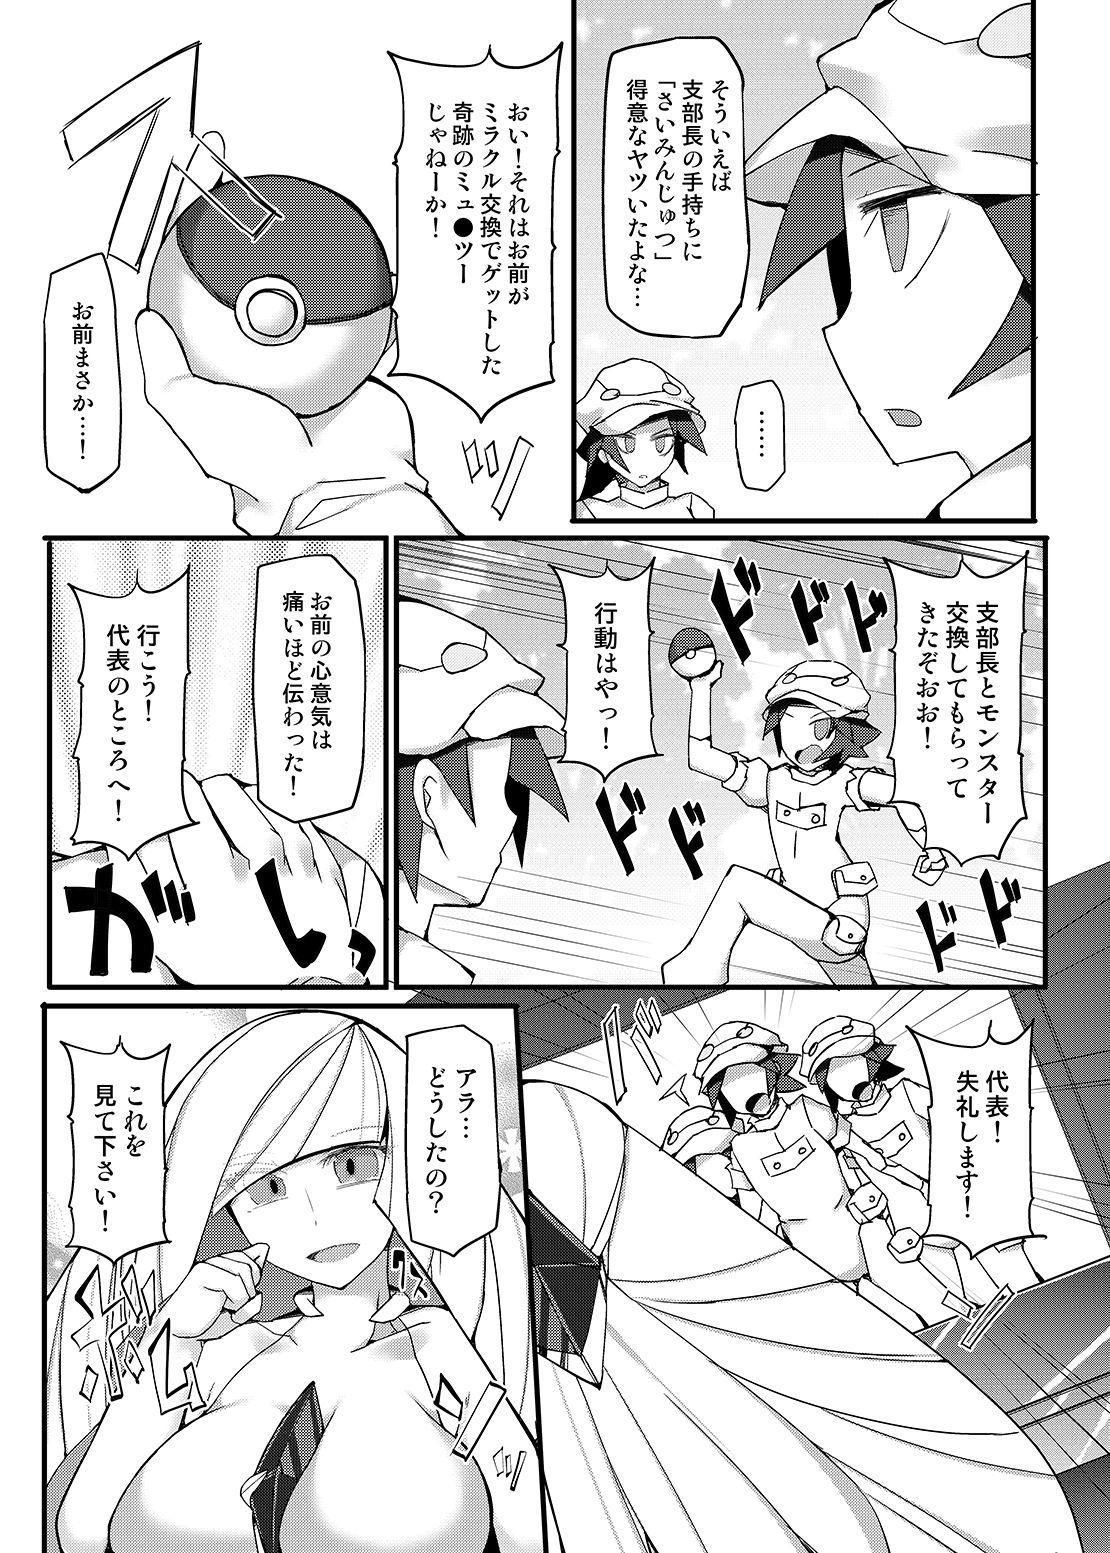 [Stapspats (Hisui)] Stapspats [Pocket Monster Saimin Series Soushuuhen] 1 Collective Hypnosis (Pokémon) [Digital] 61